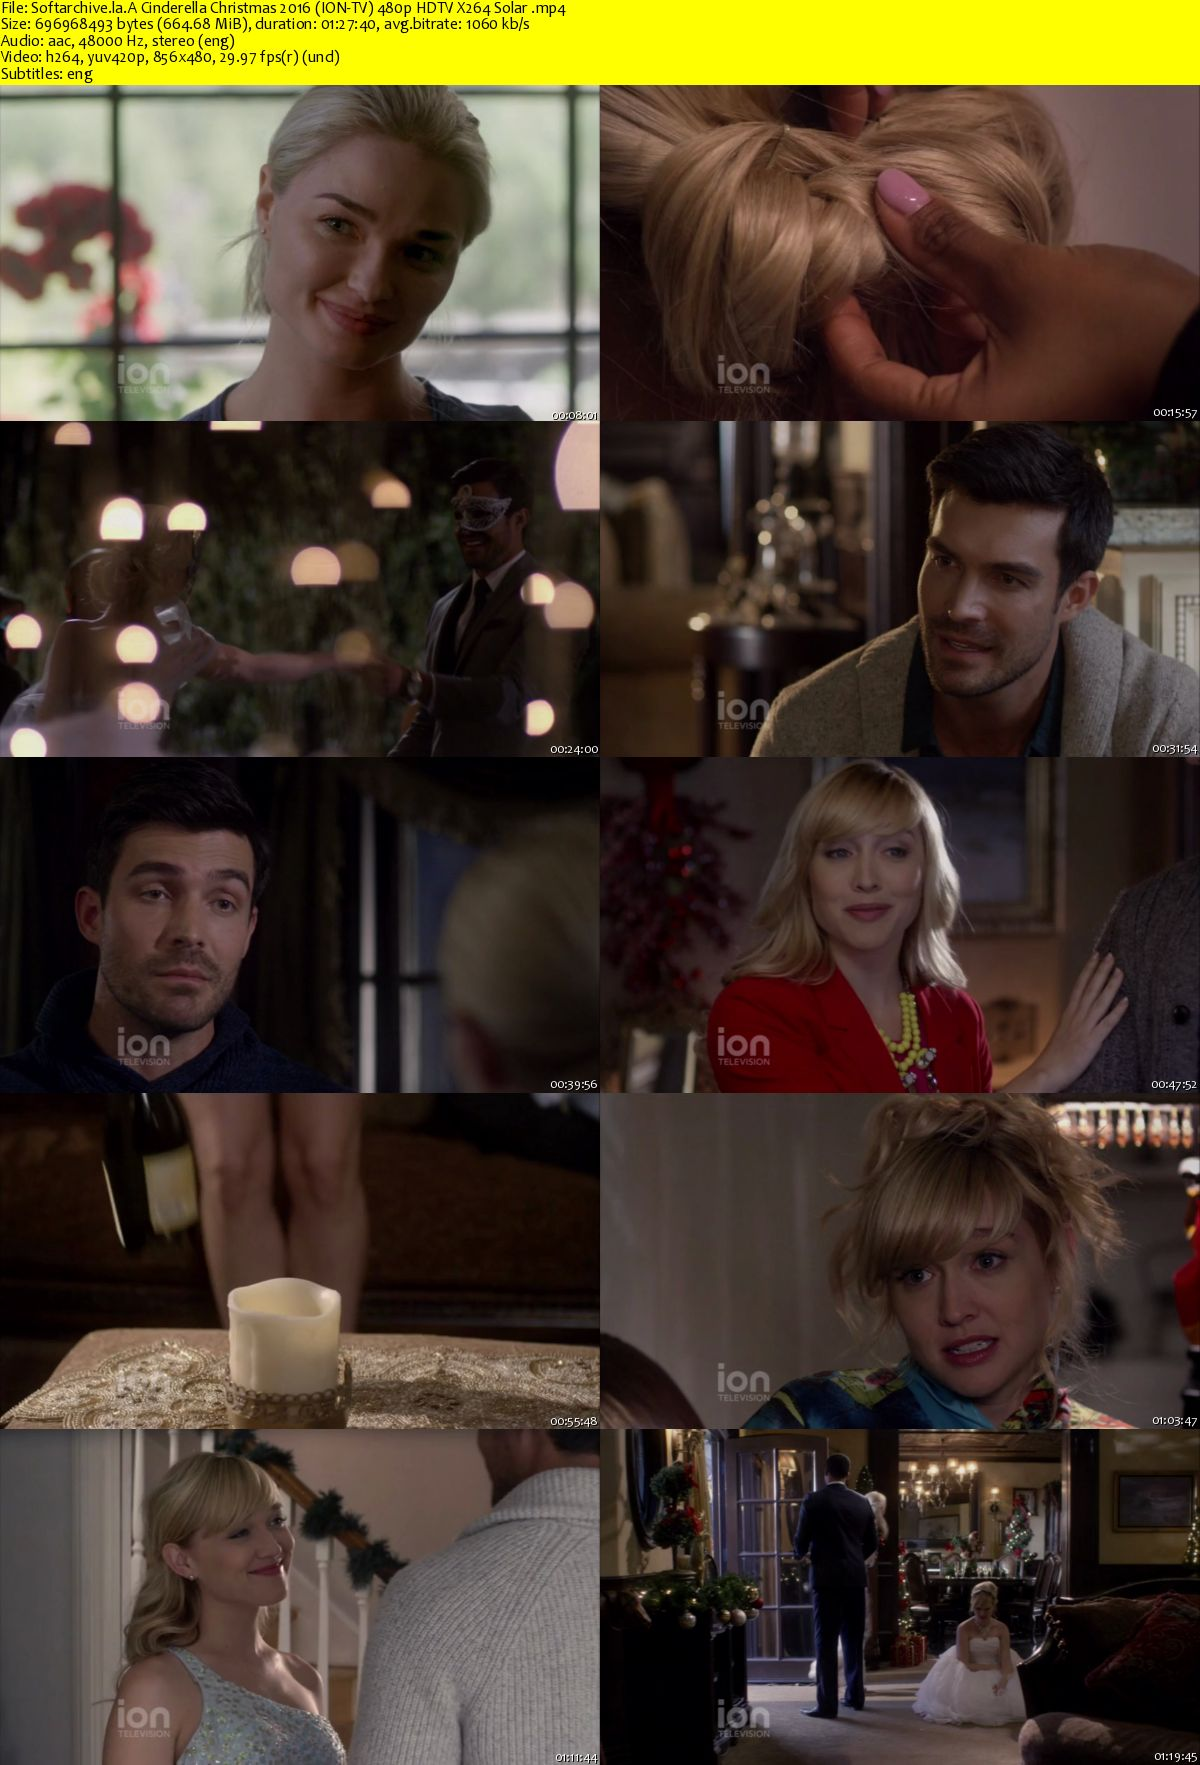 A Cinderella Christmas.Download A Cinderella Christmas 2016 Ion Tv 480p Hdtv X264